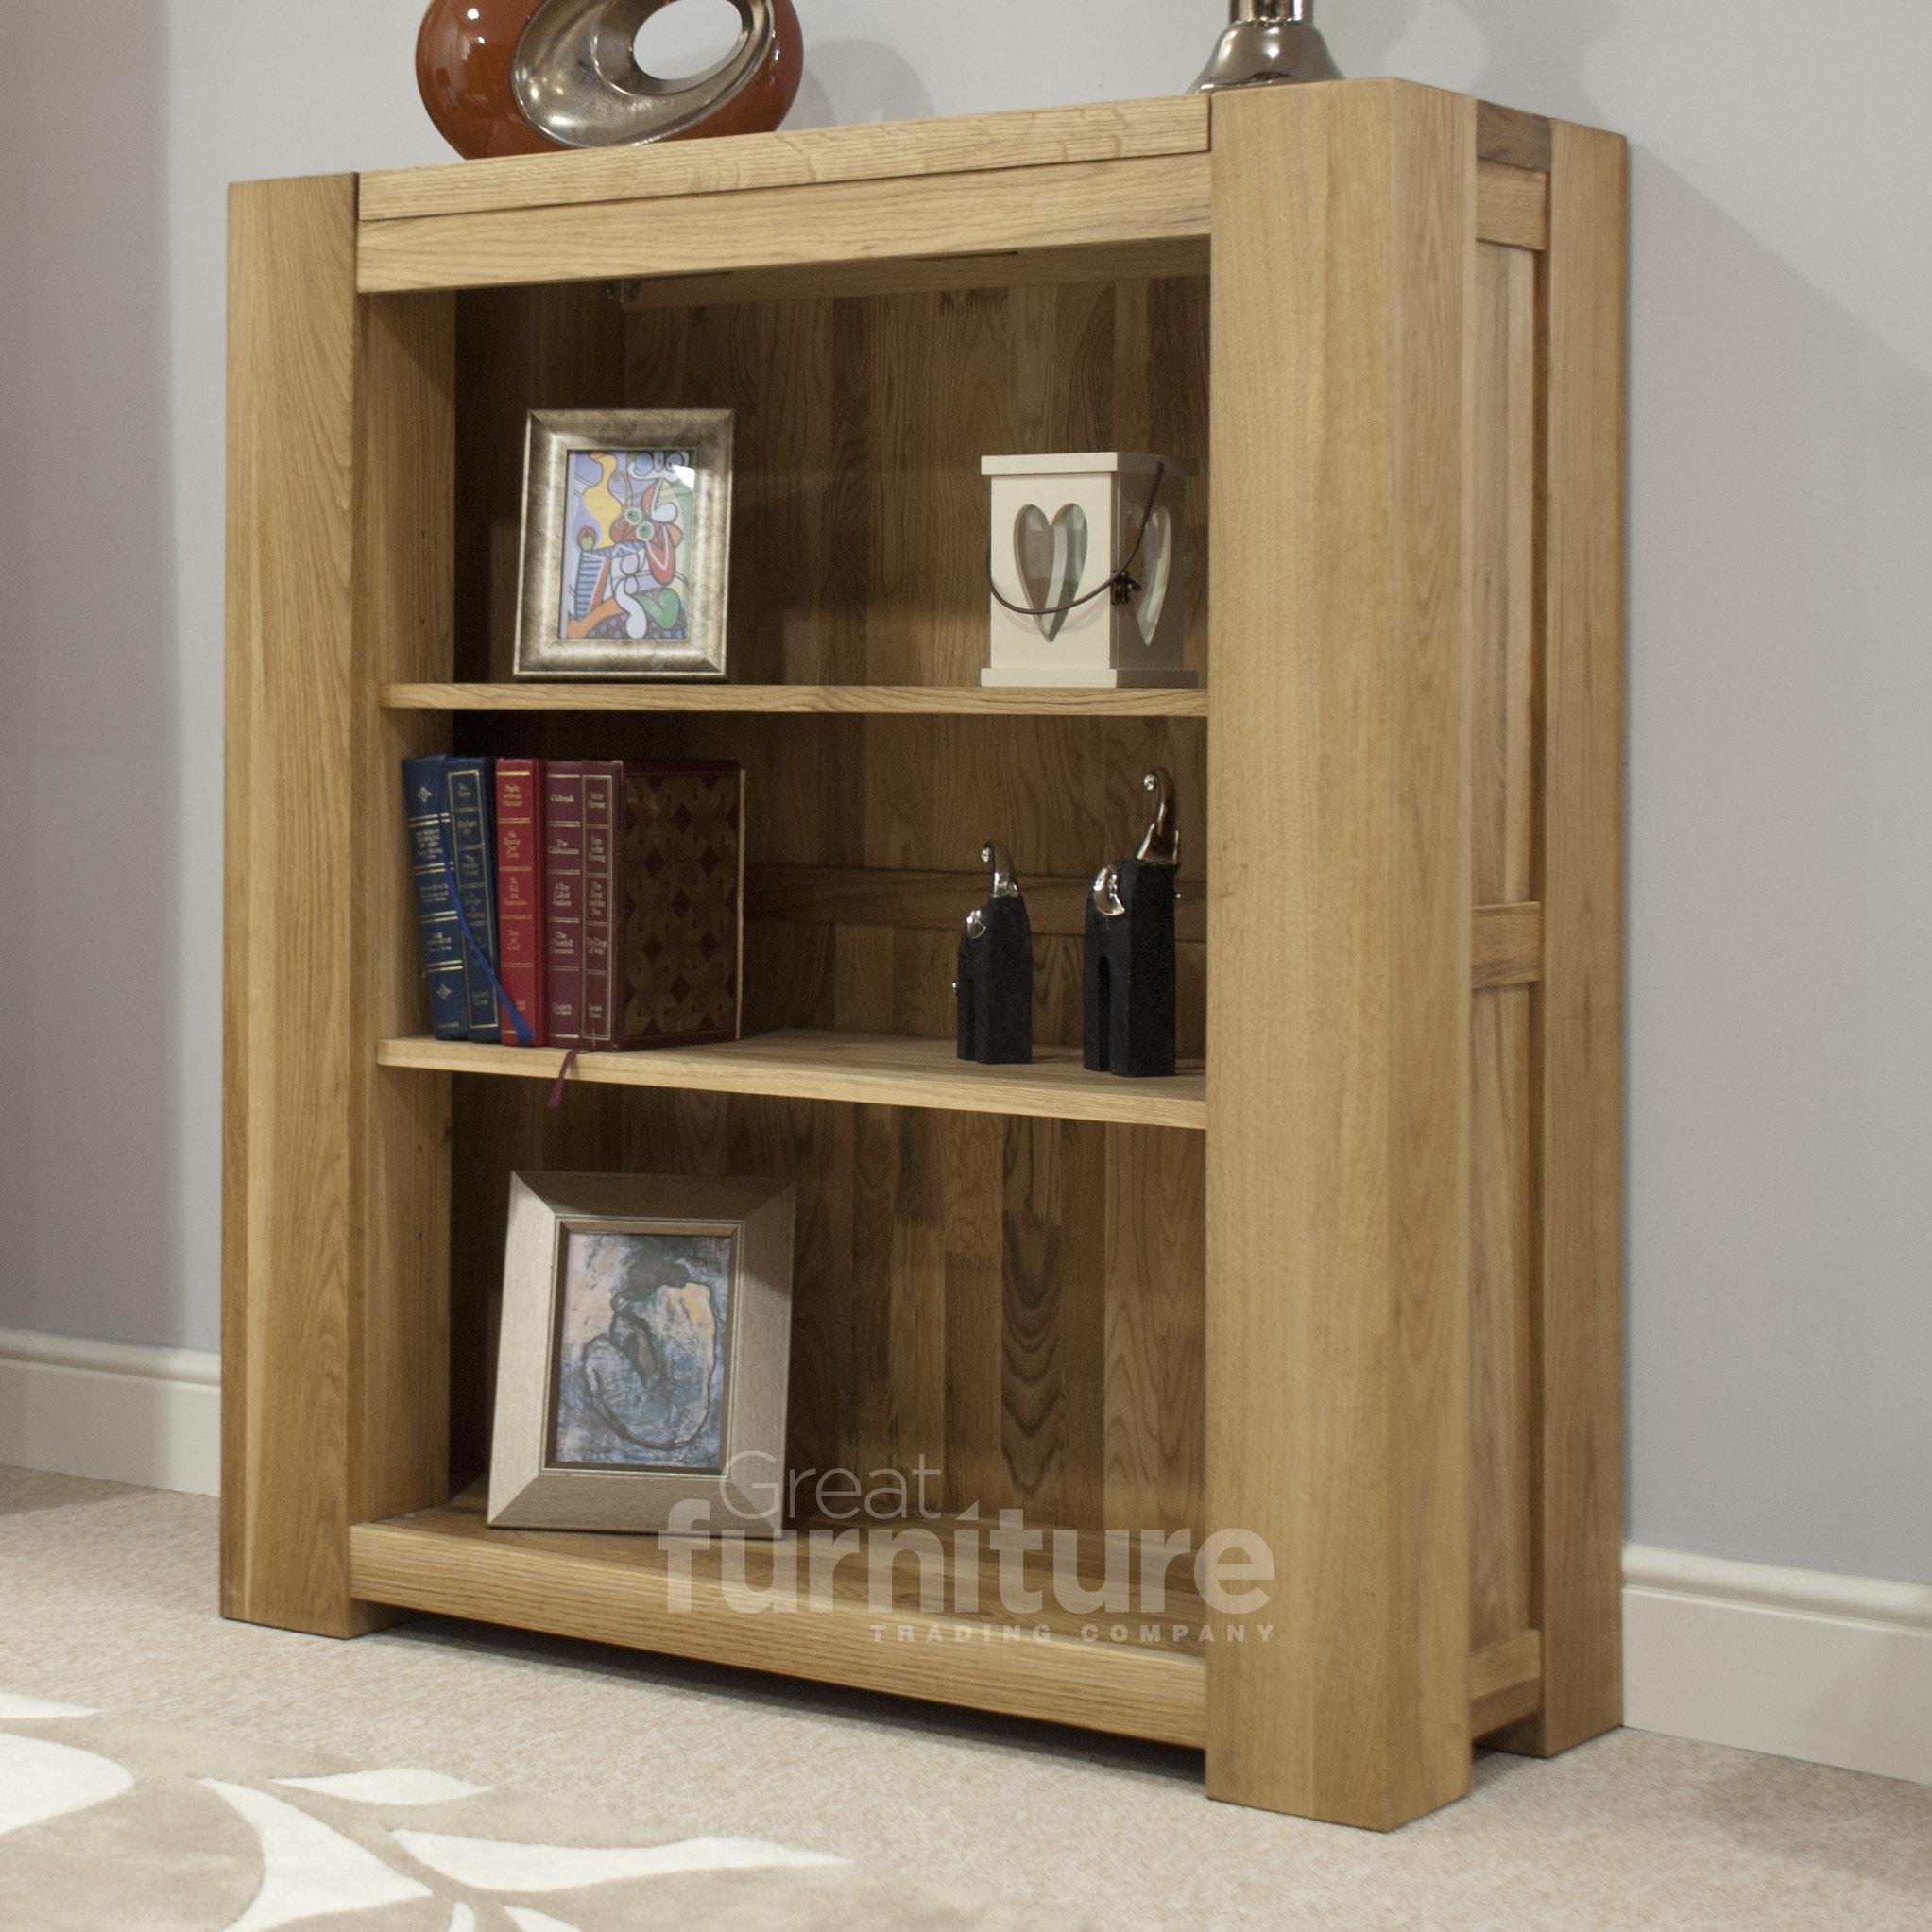 Photo of Trend 105cm oak bookcases